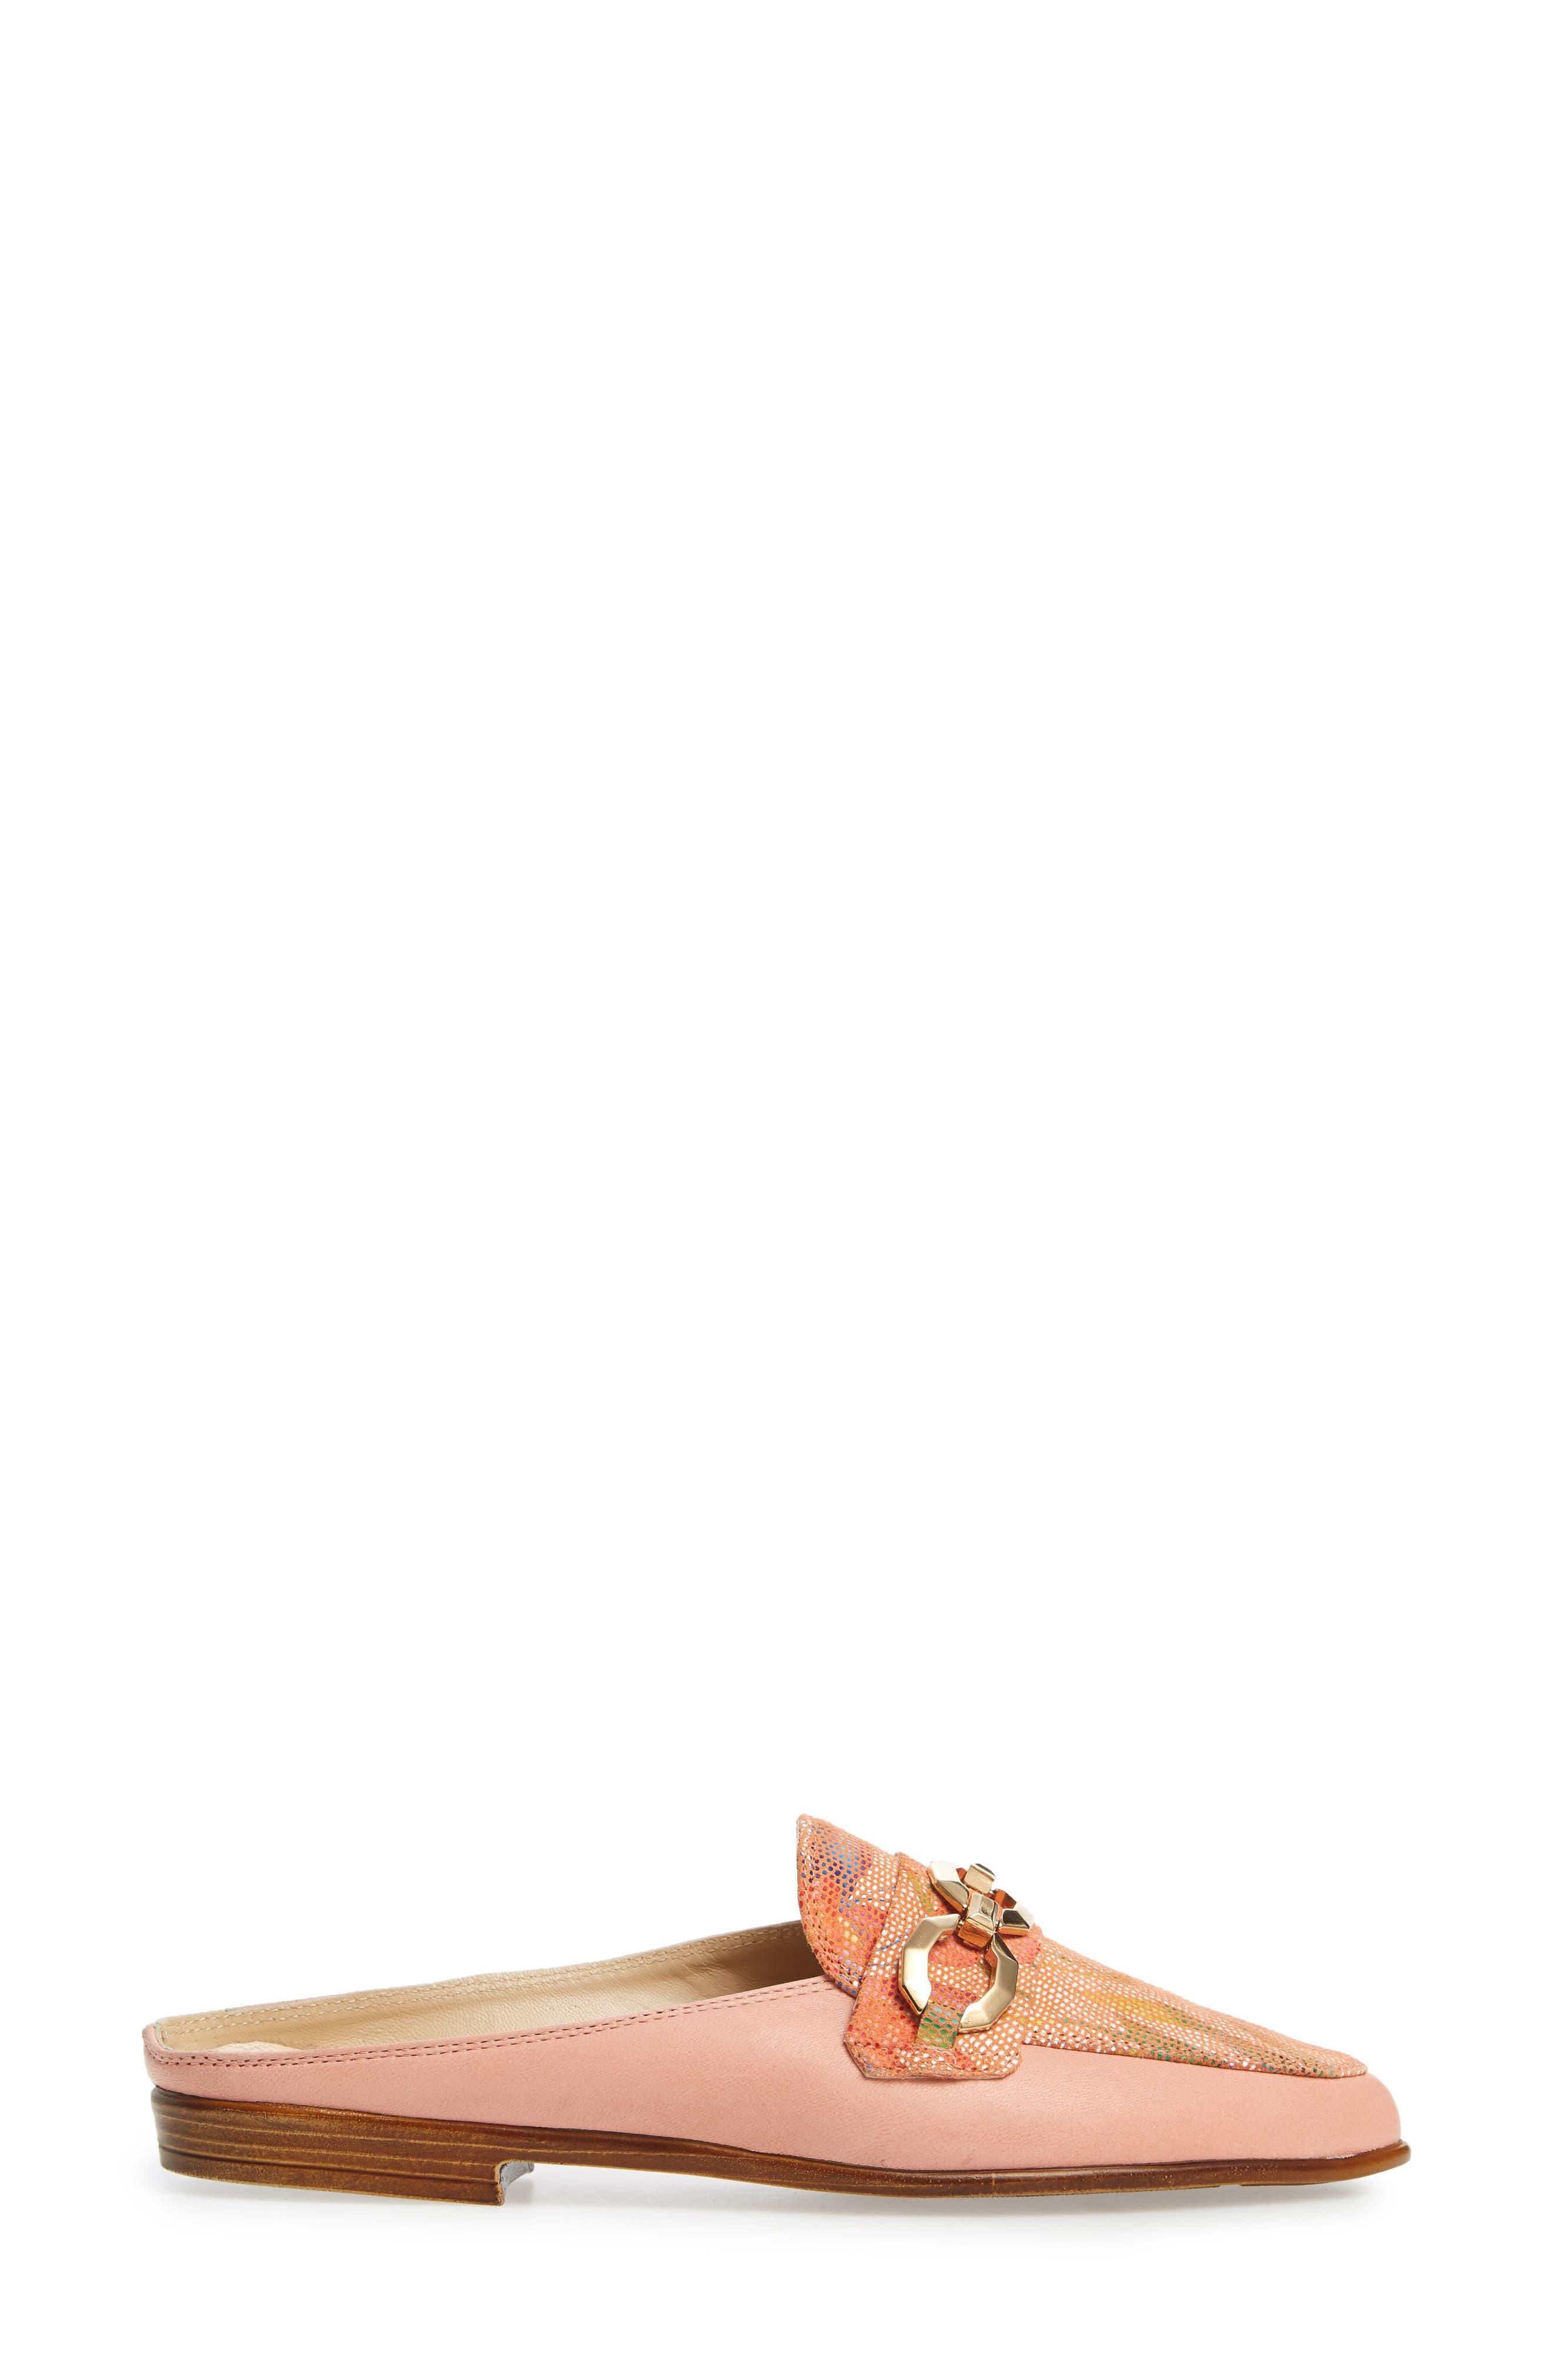 Almafi by Rangoni Otranto Loafer Slide,                             Alternate thumbnail 3, color,                             Rose Leather